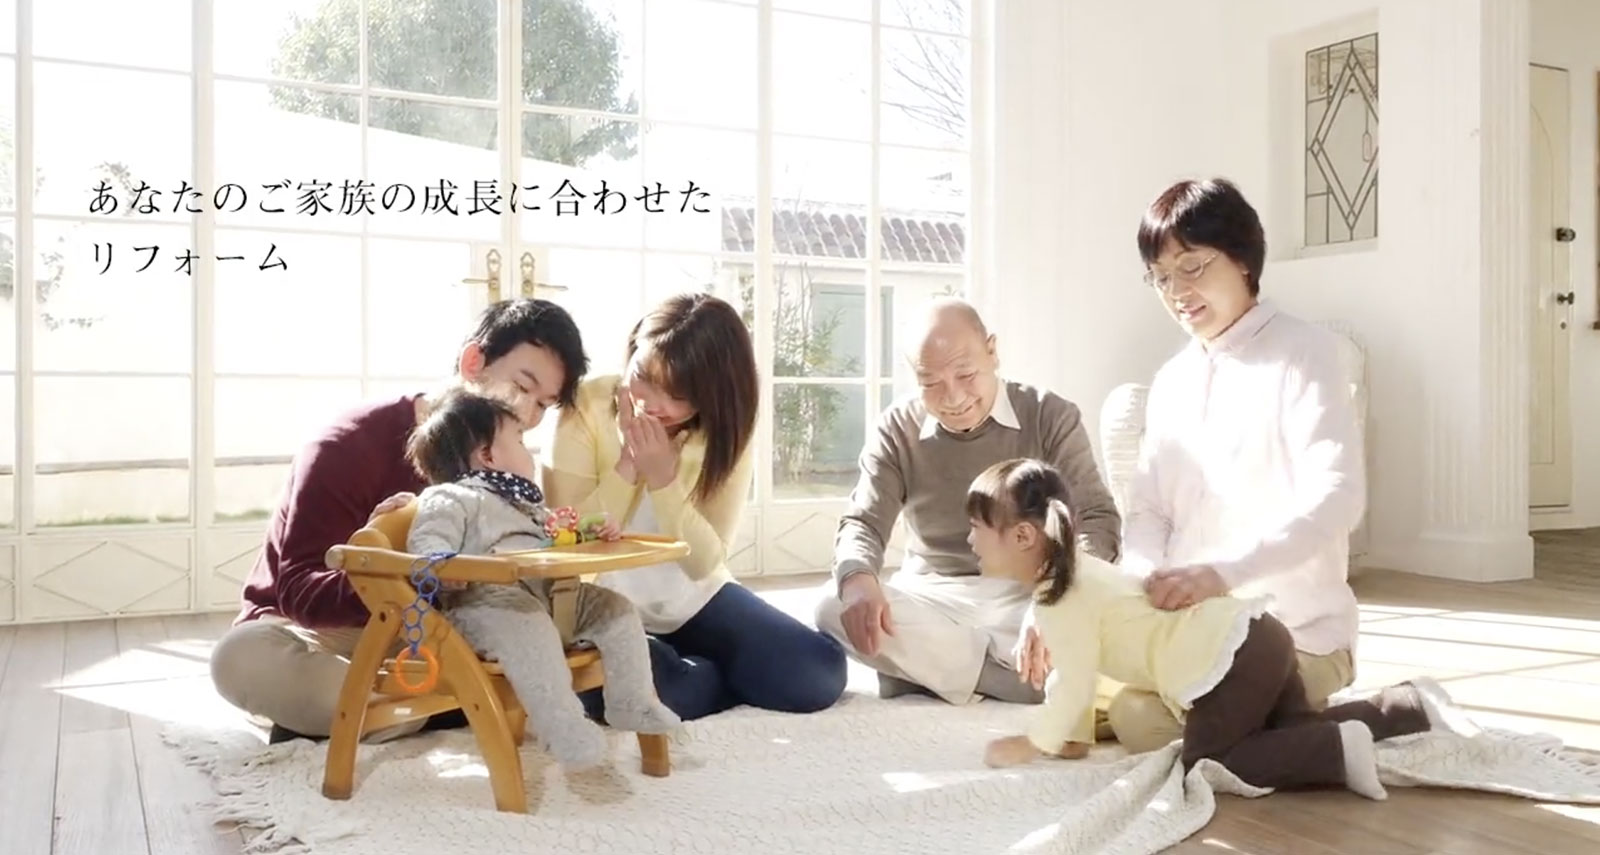 Shoei彩工房リフォーム特設サイト